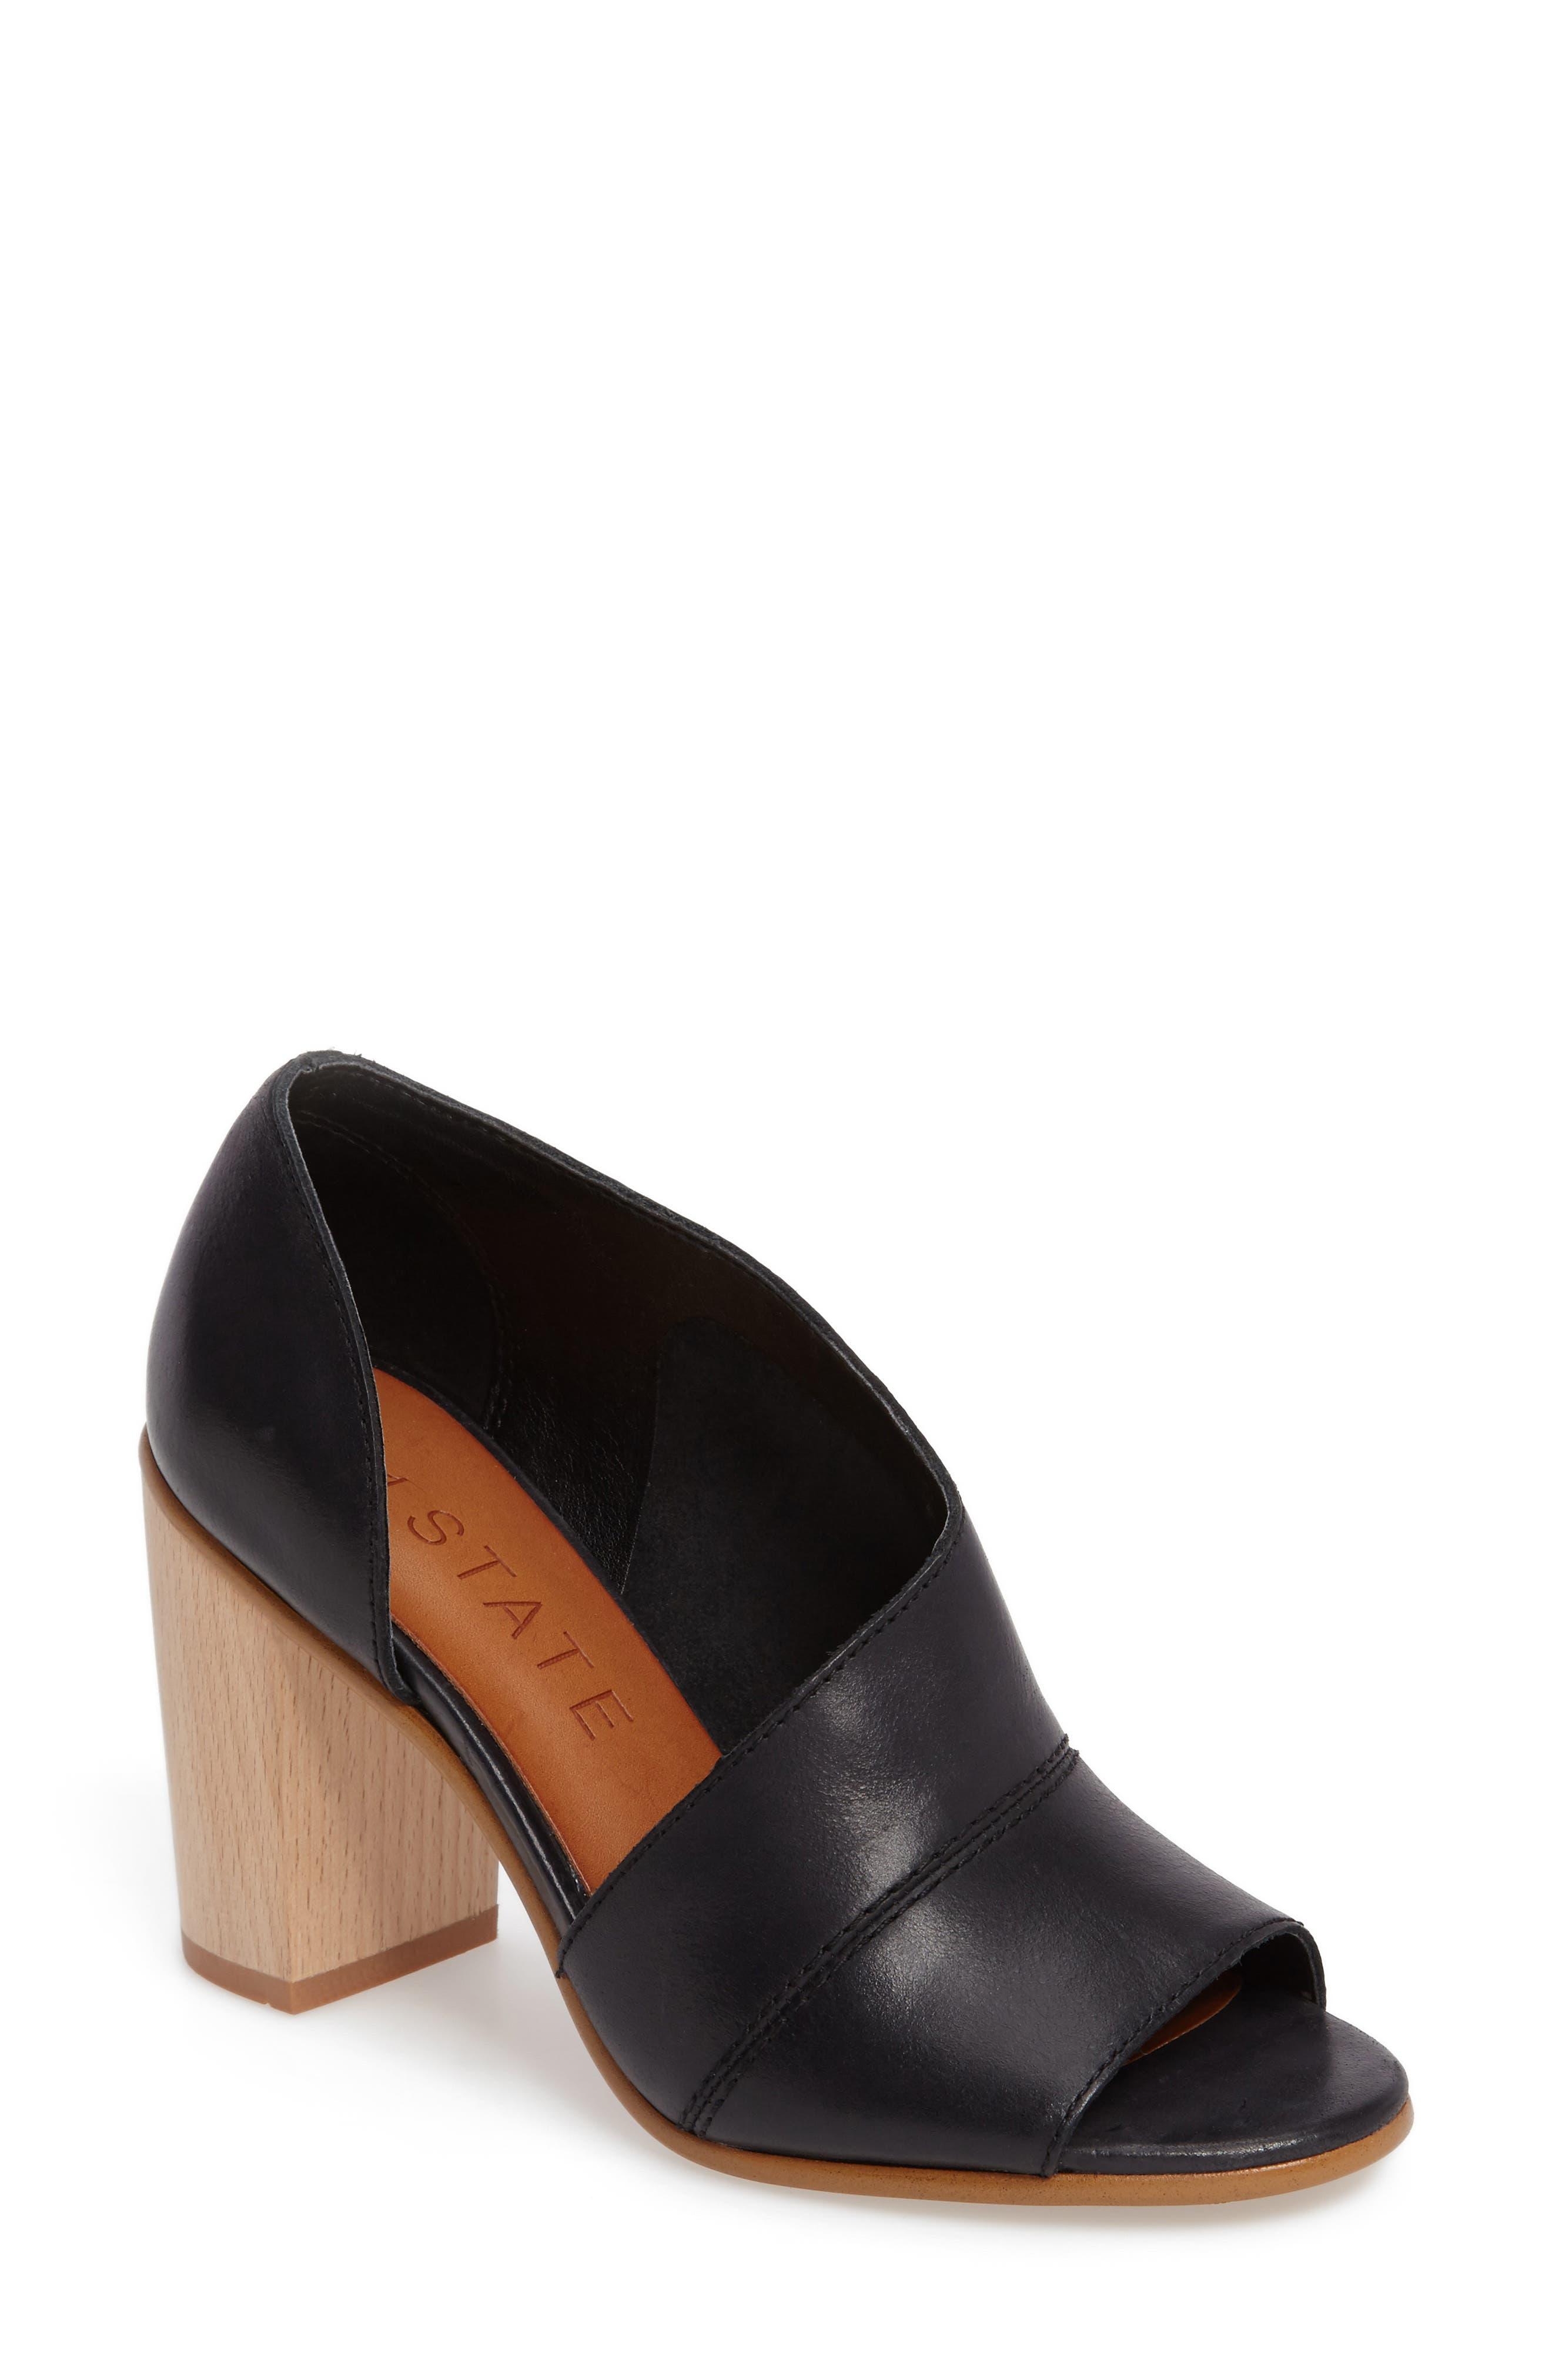 Amble Asymmetrical Sandal,                             Main thumbnail 1, color,                             001